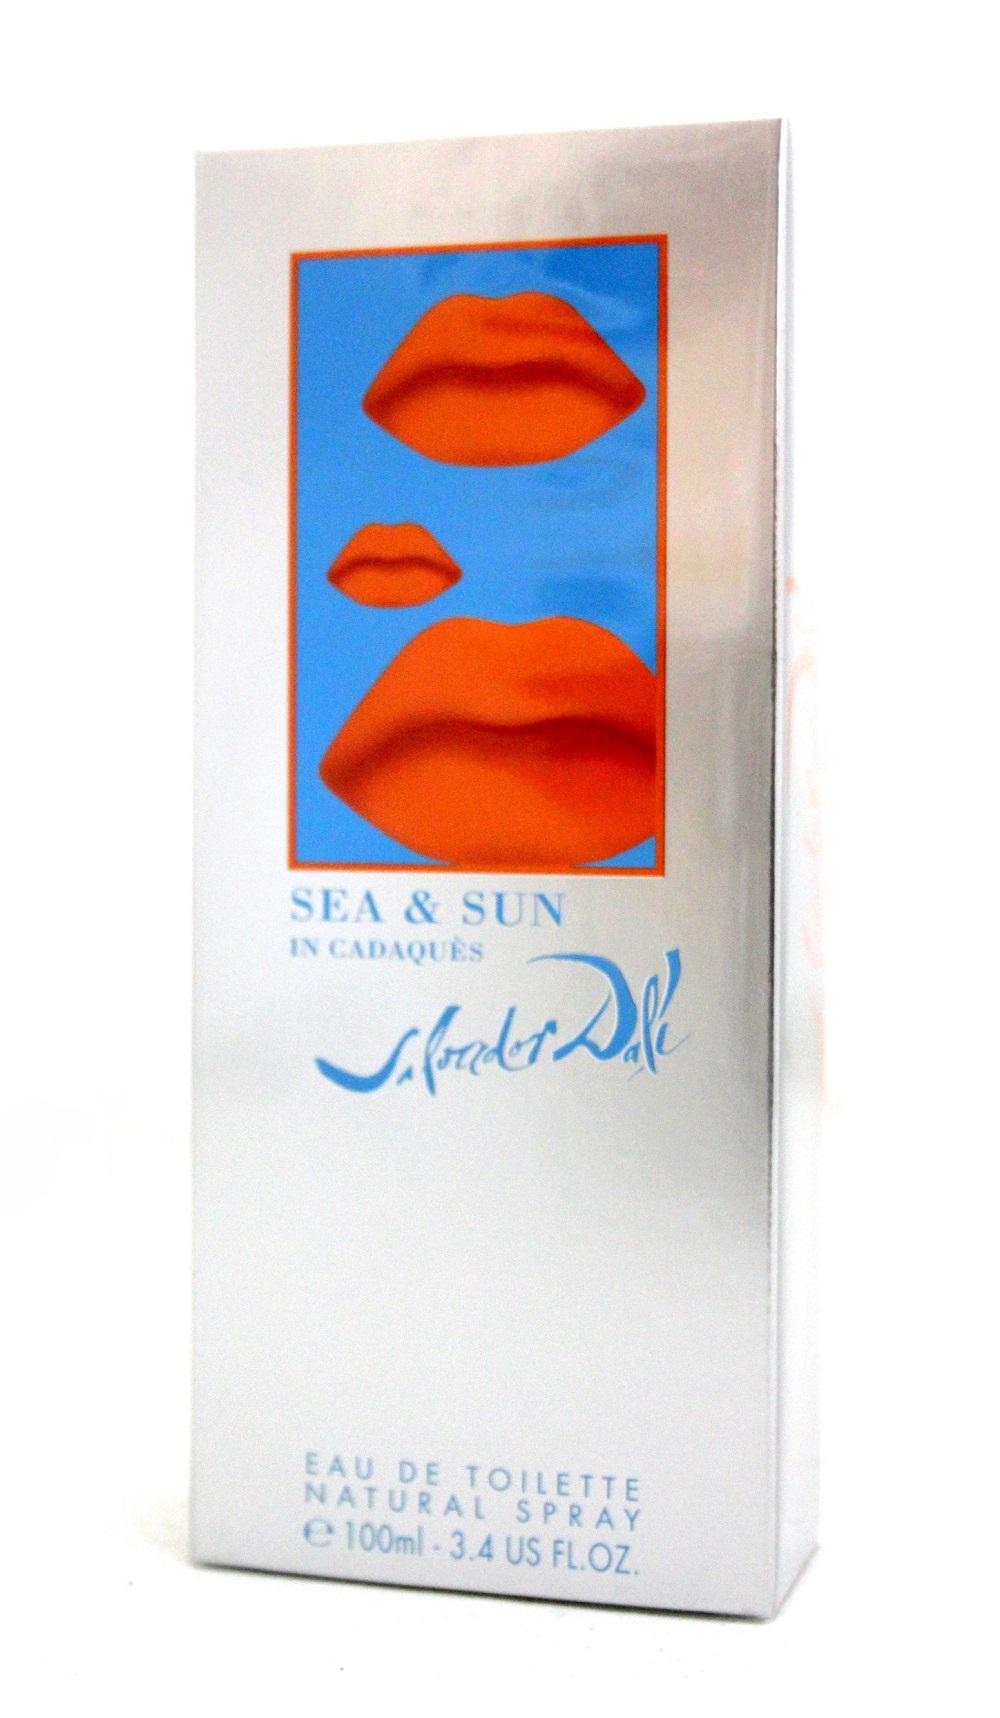 Salvador Dali Sea & Sun in Cadaques Eau de Toilette